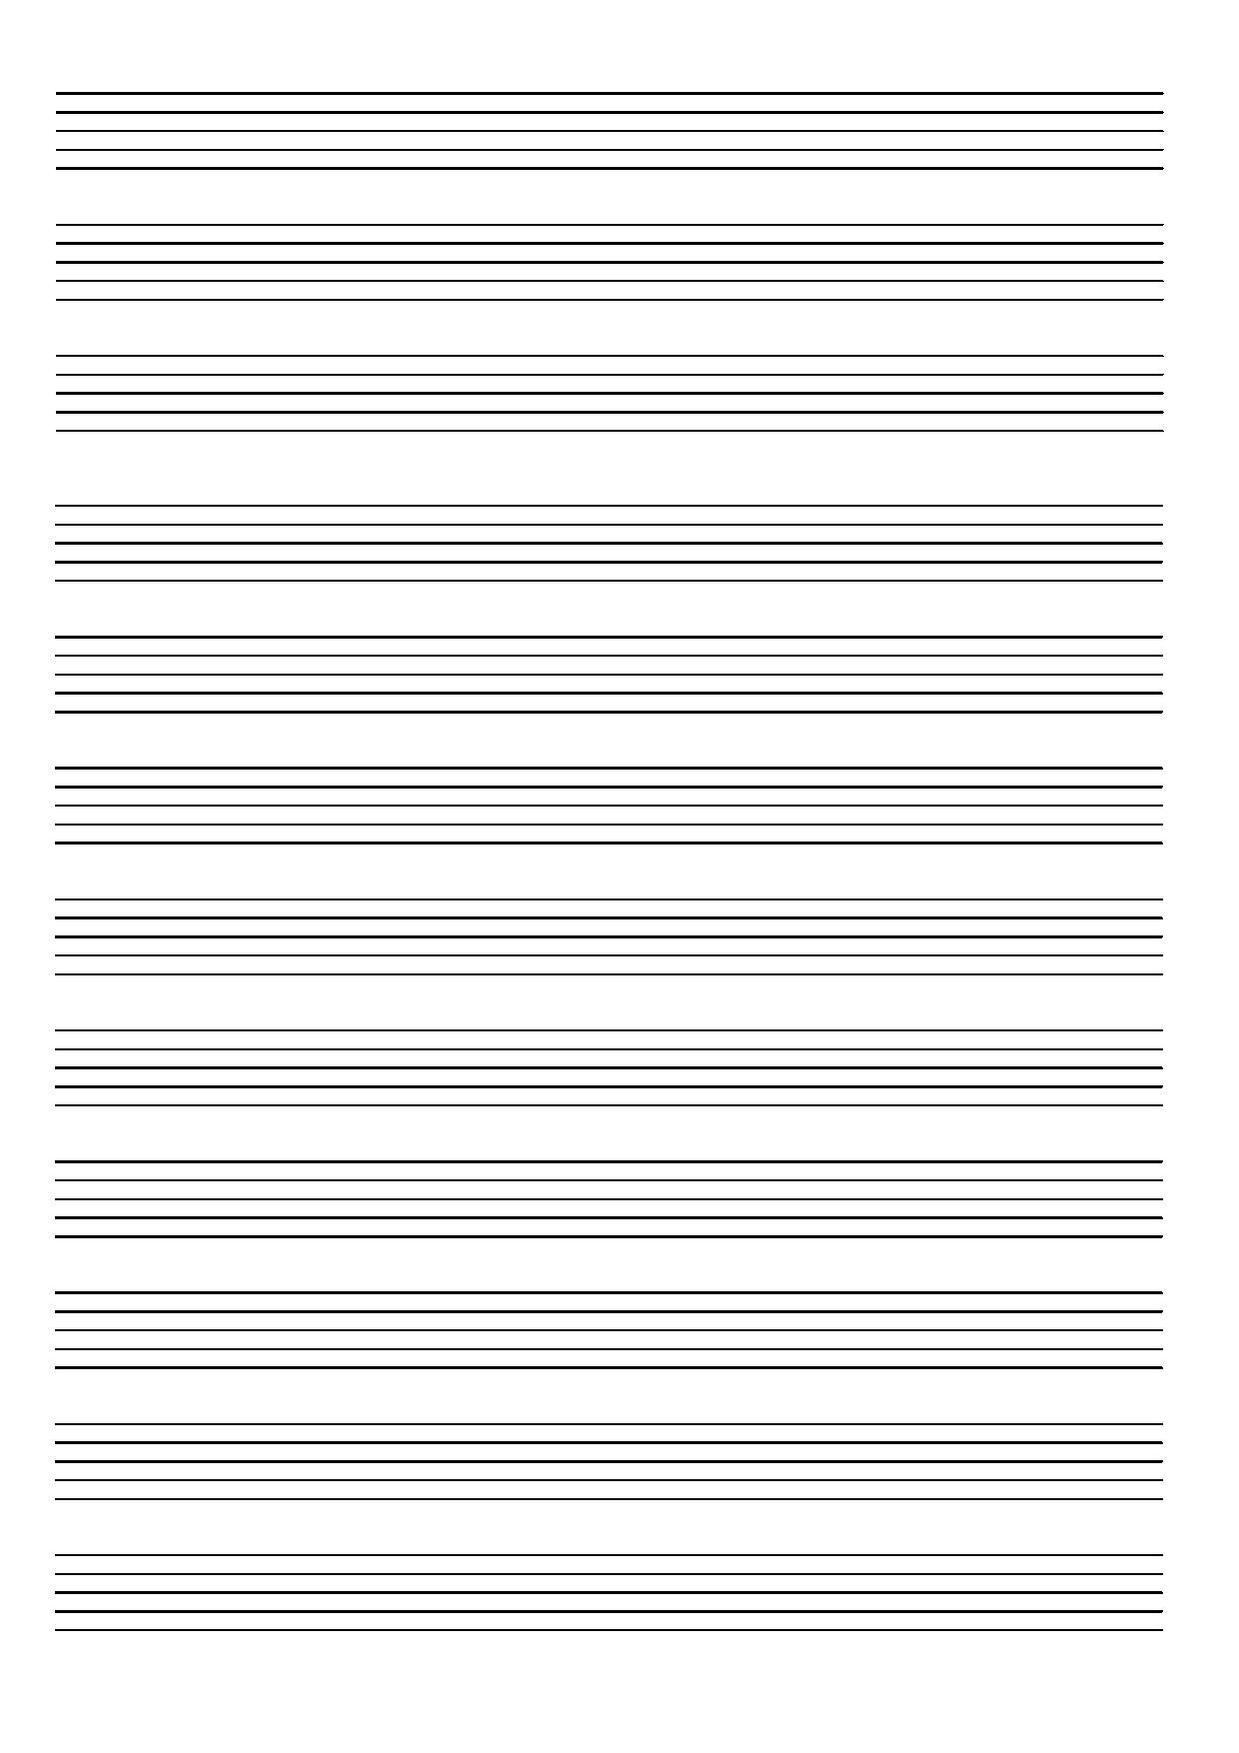 ... 1,239 × 1,754 pixels, file size: 3 KB, MIME type: application/pdf: commons.wikimedia.org/wiki/File:Papier_à_musique.pdf